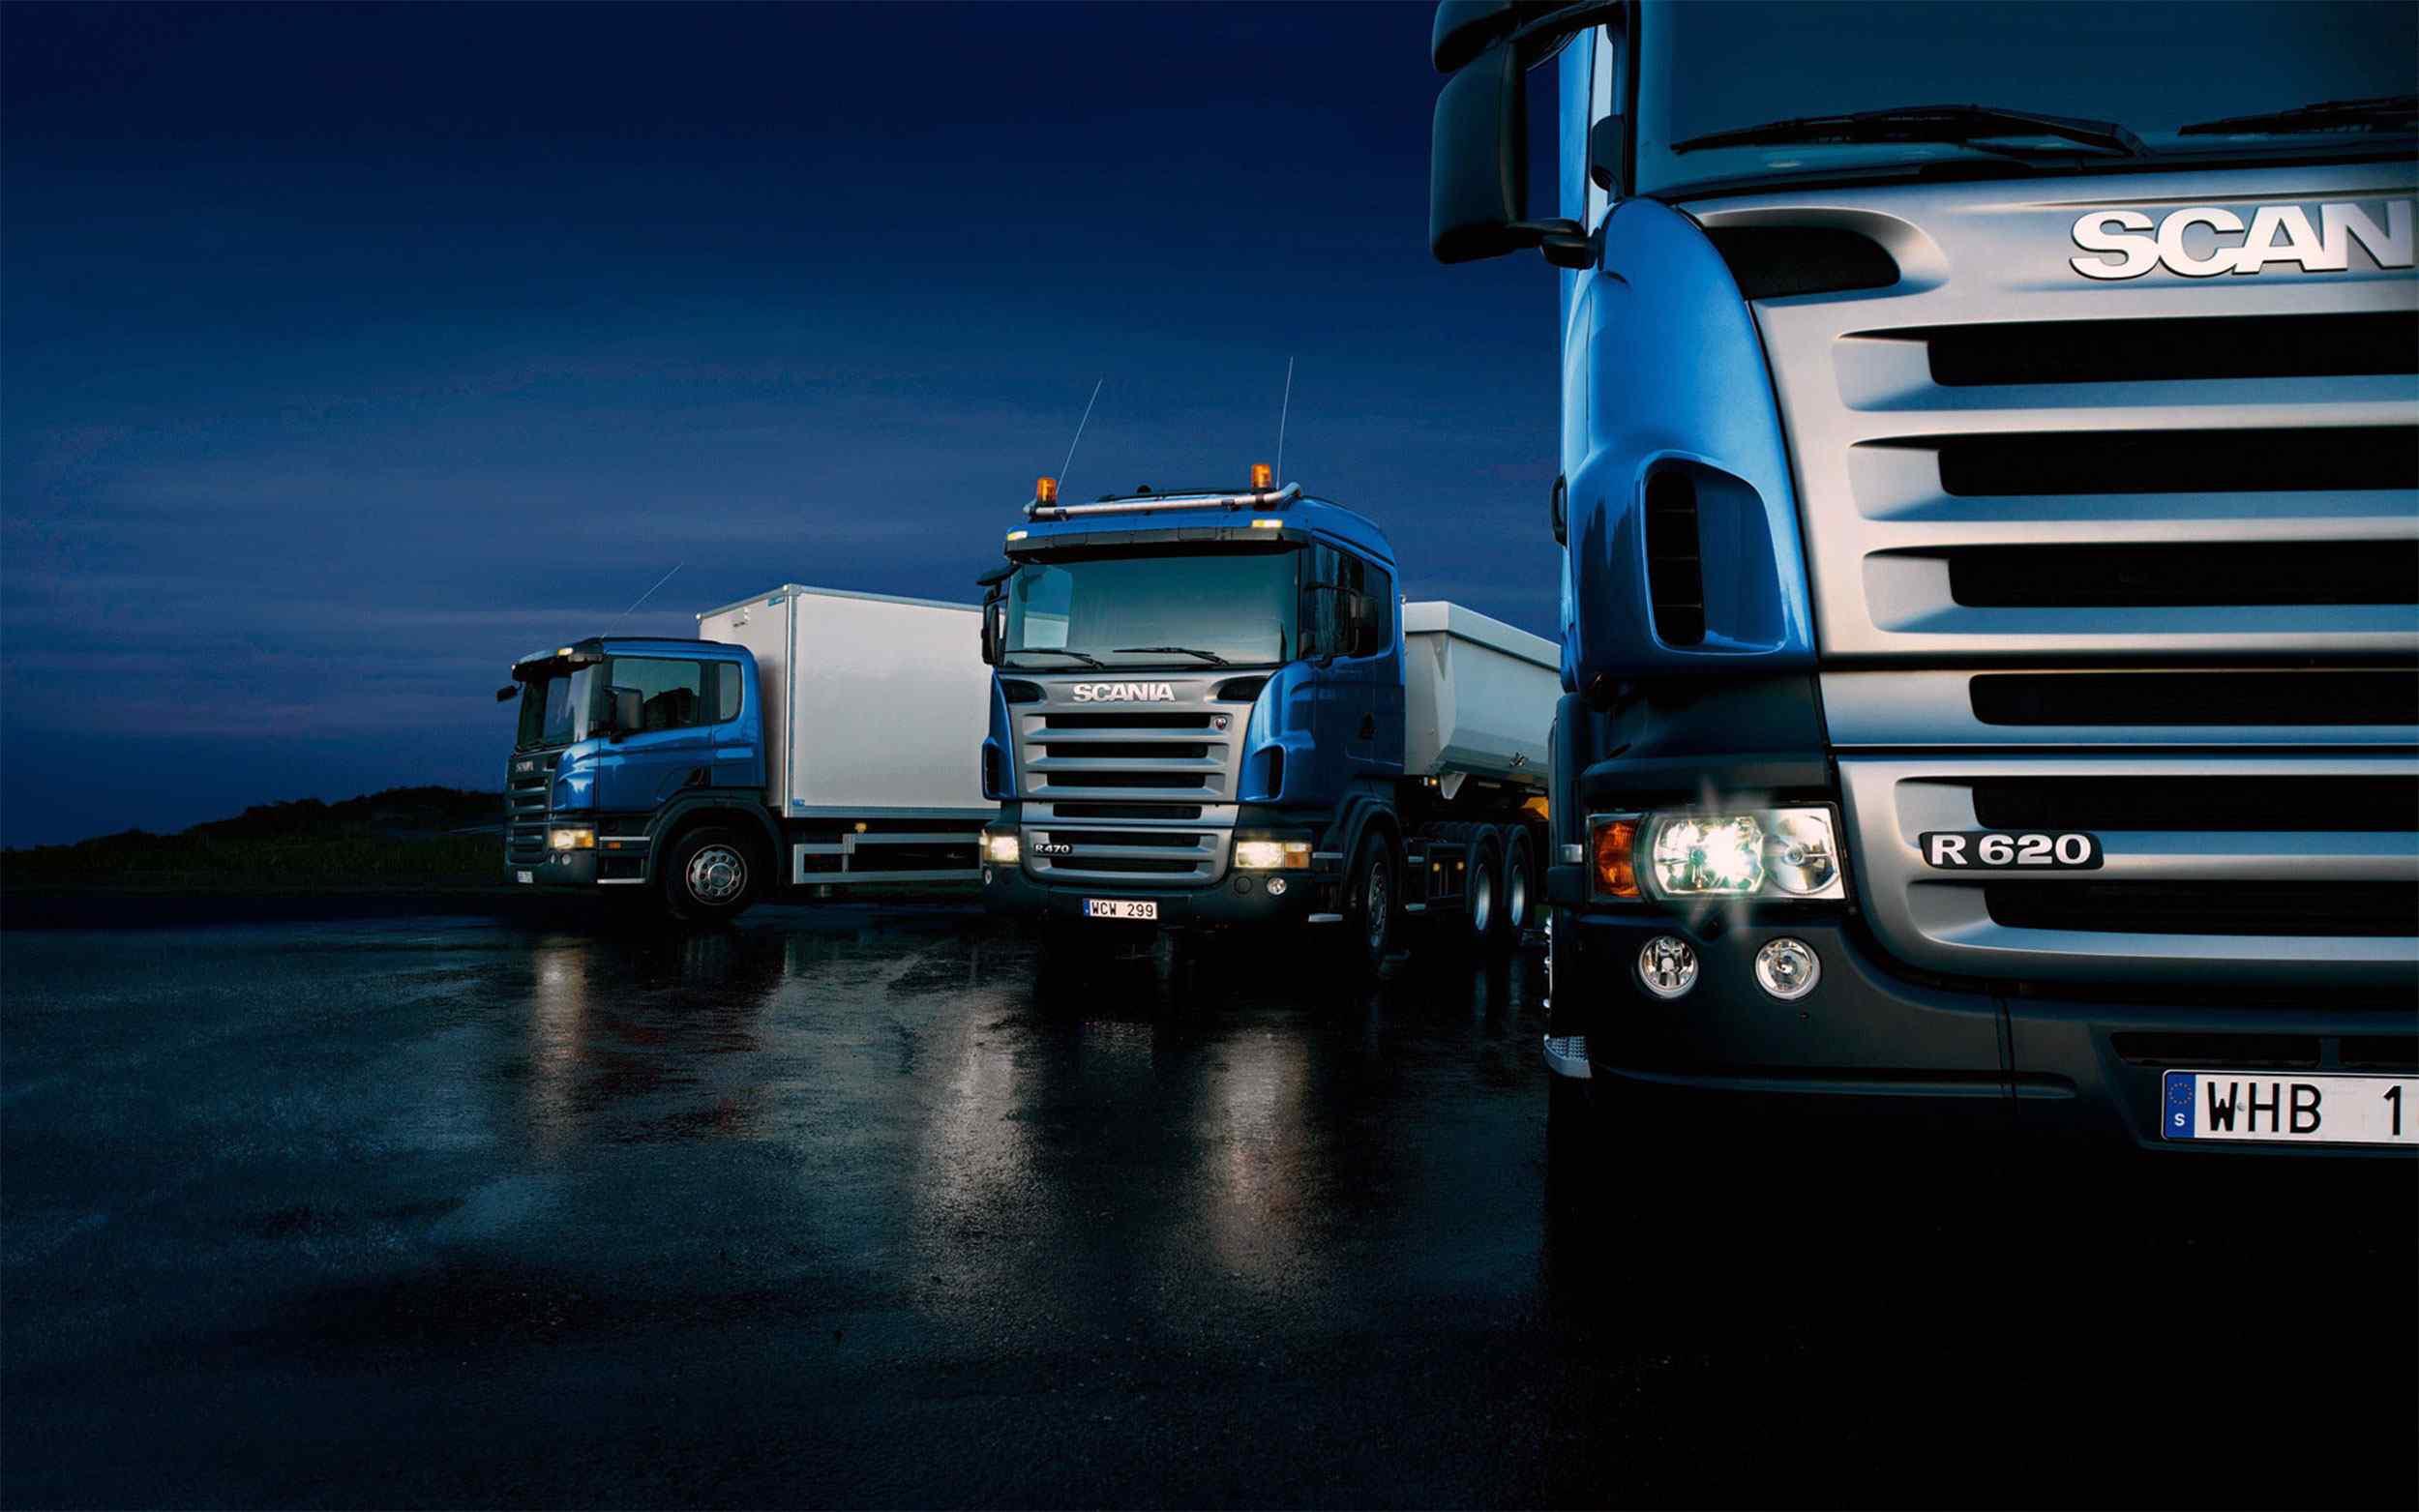 Three-trucks-on-blue-background.jpg